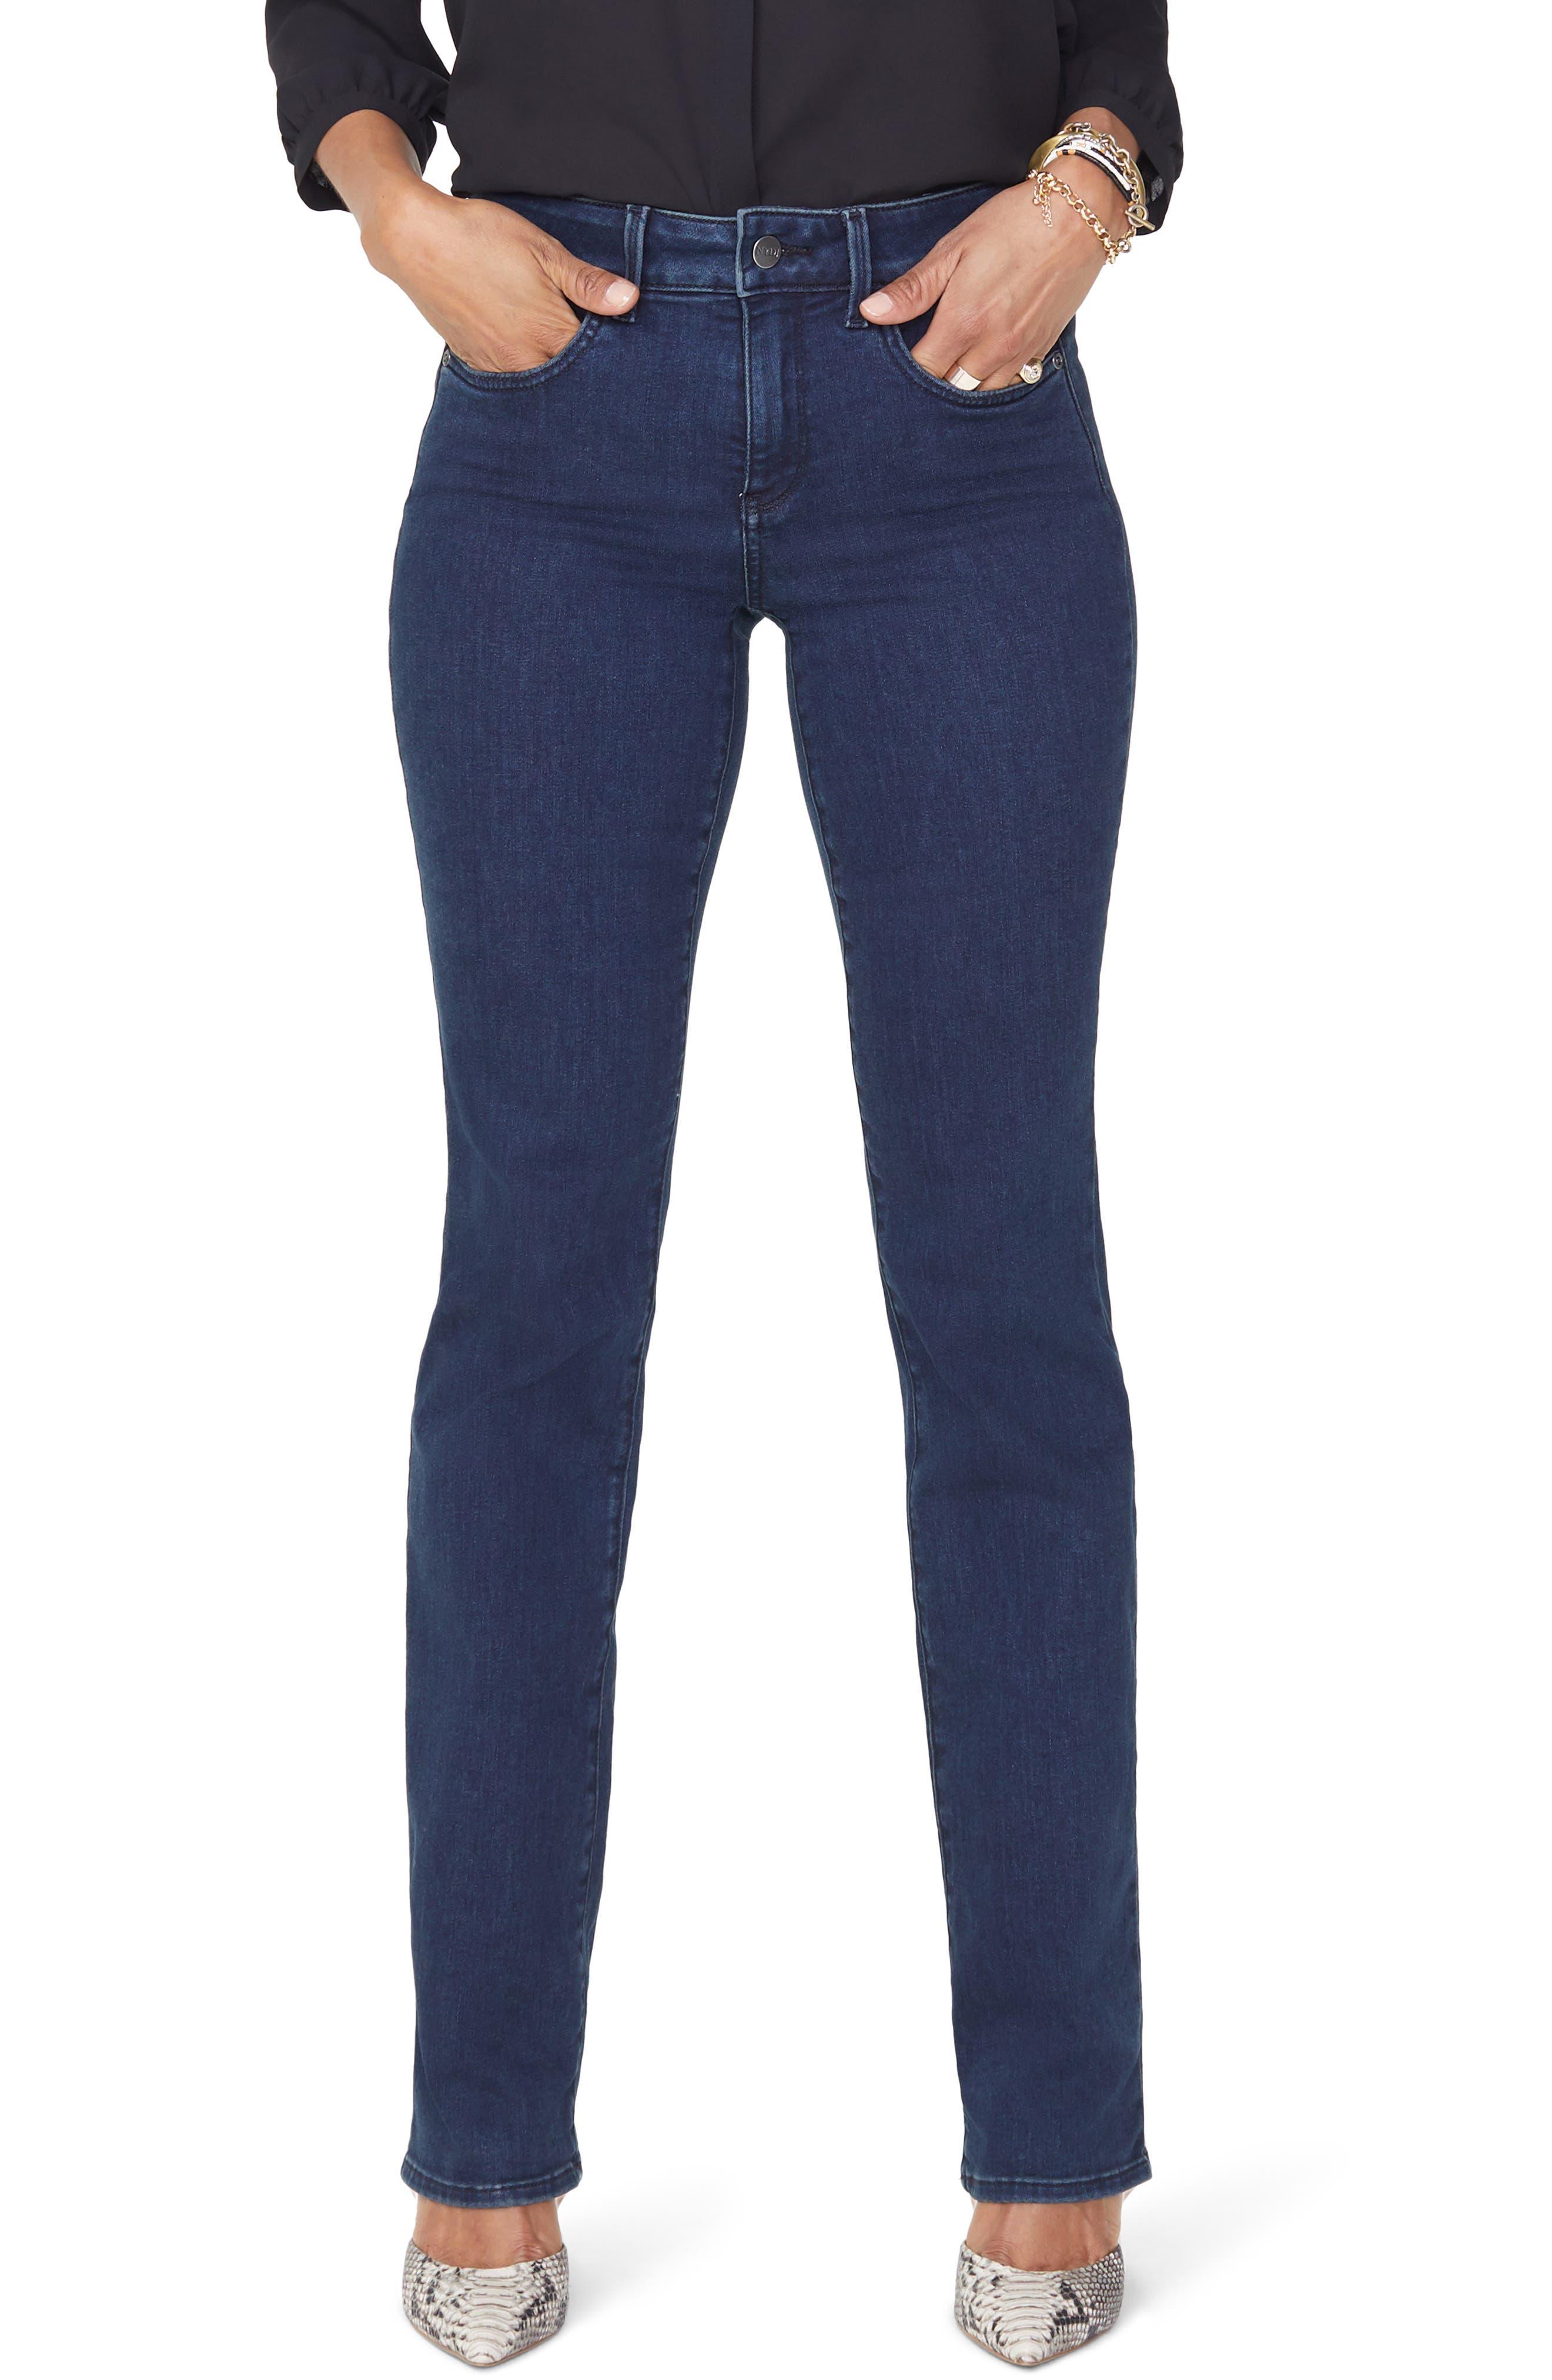 NYDJ Marilyn Stretch Straight Leg Jeans, Main, color, 405